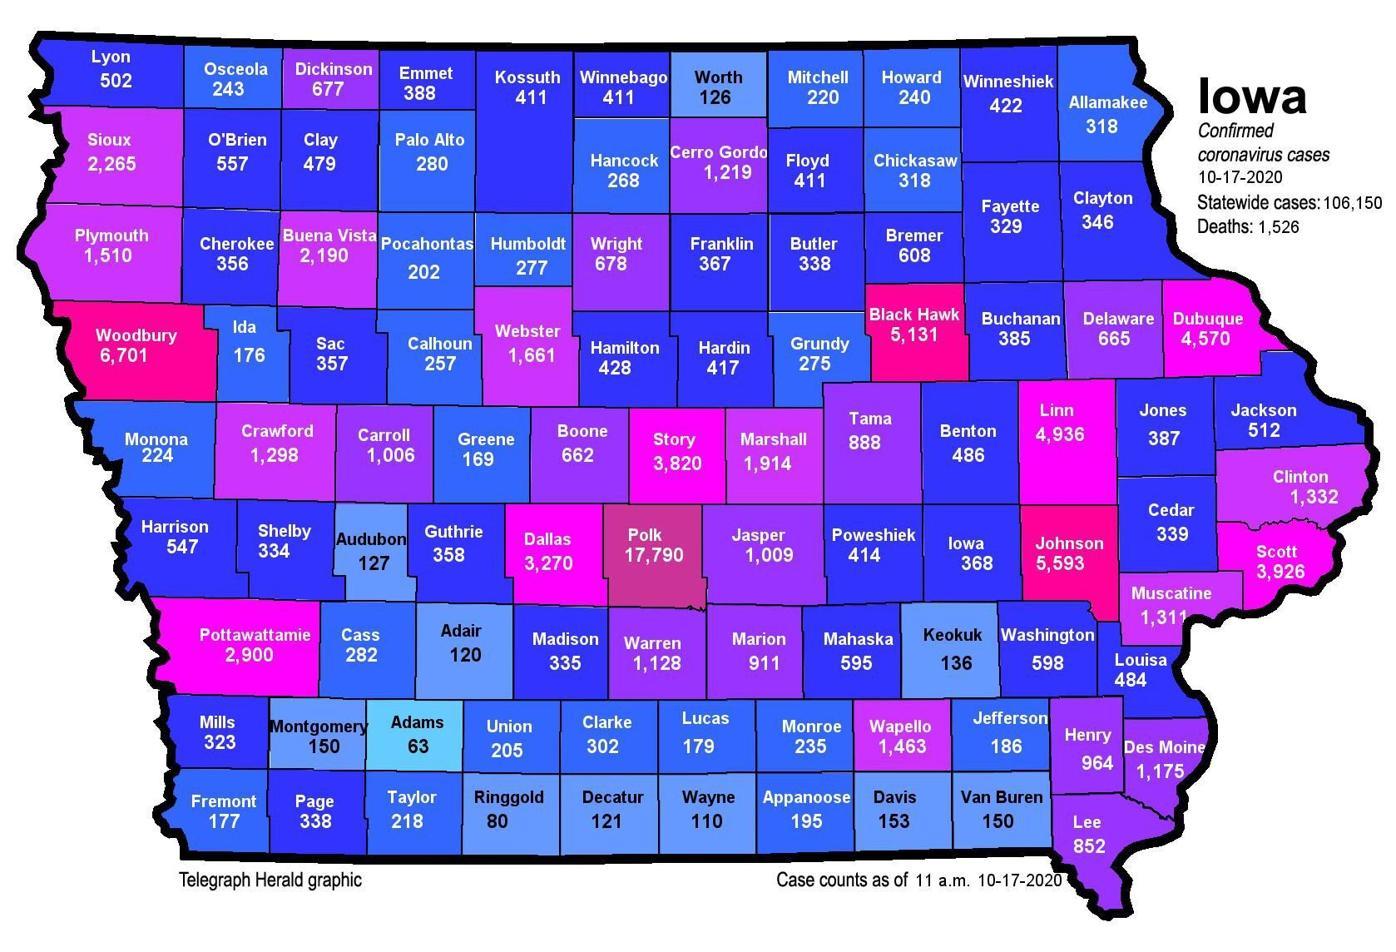 Iowa COVID-19 map for Oct. 17